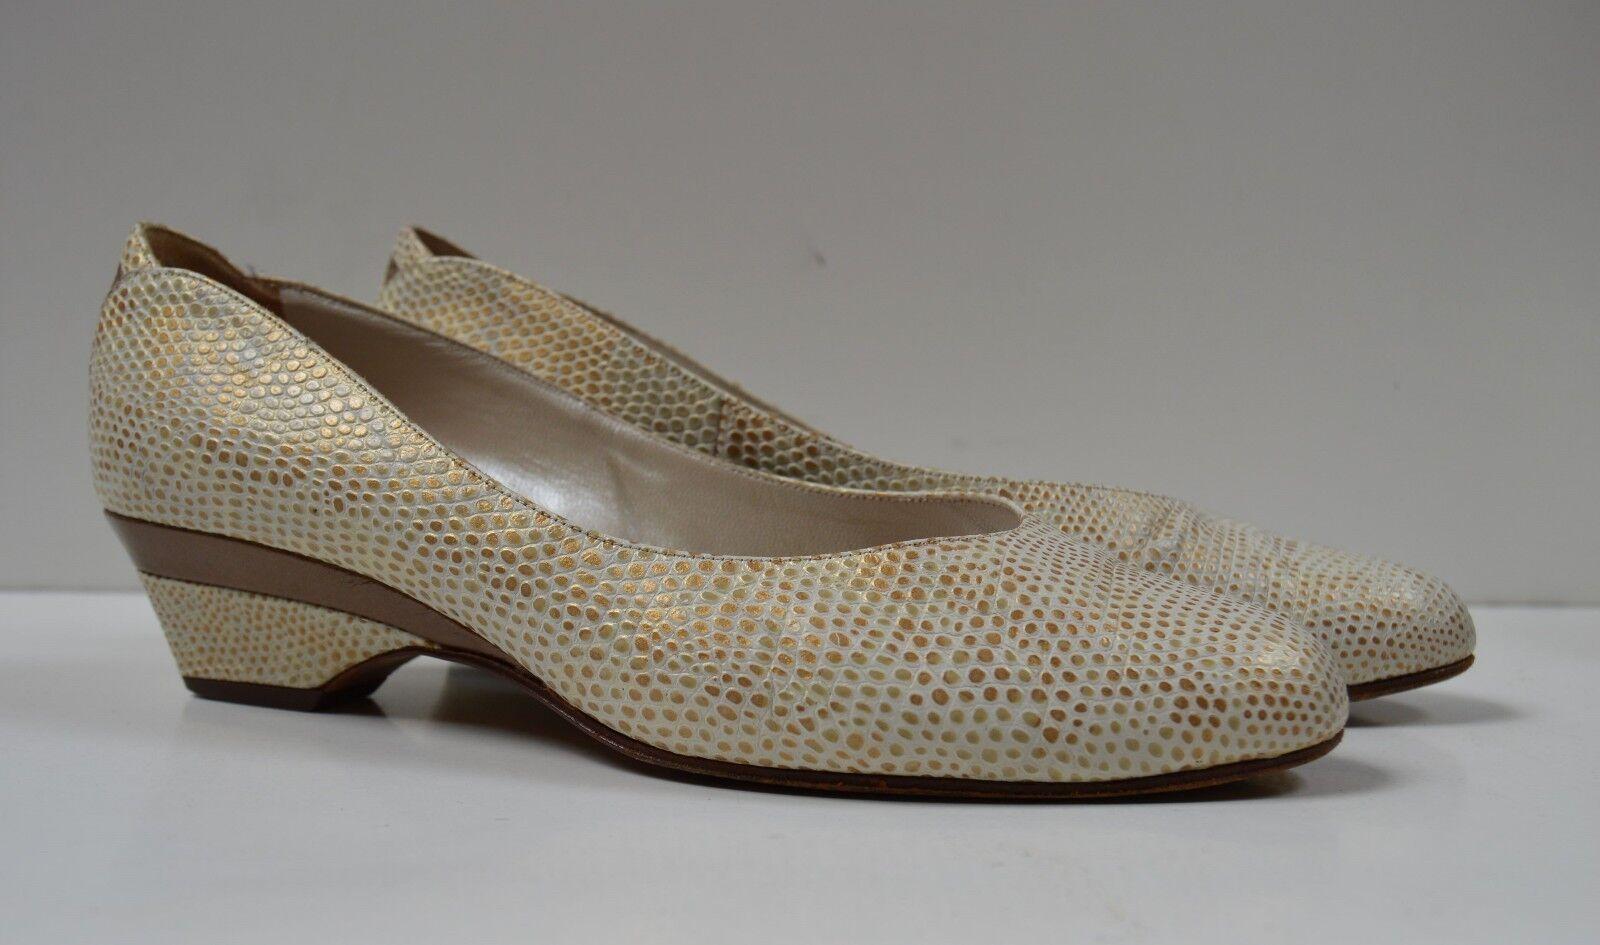 Peter Germany Kaiser Damen Pumps Ballerinas made in Germany Peter True Vintage gold perlmutt 23f24b